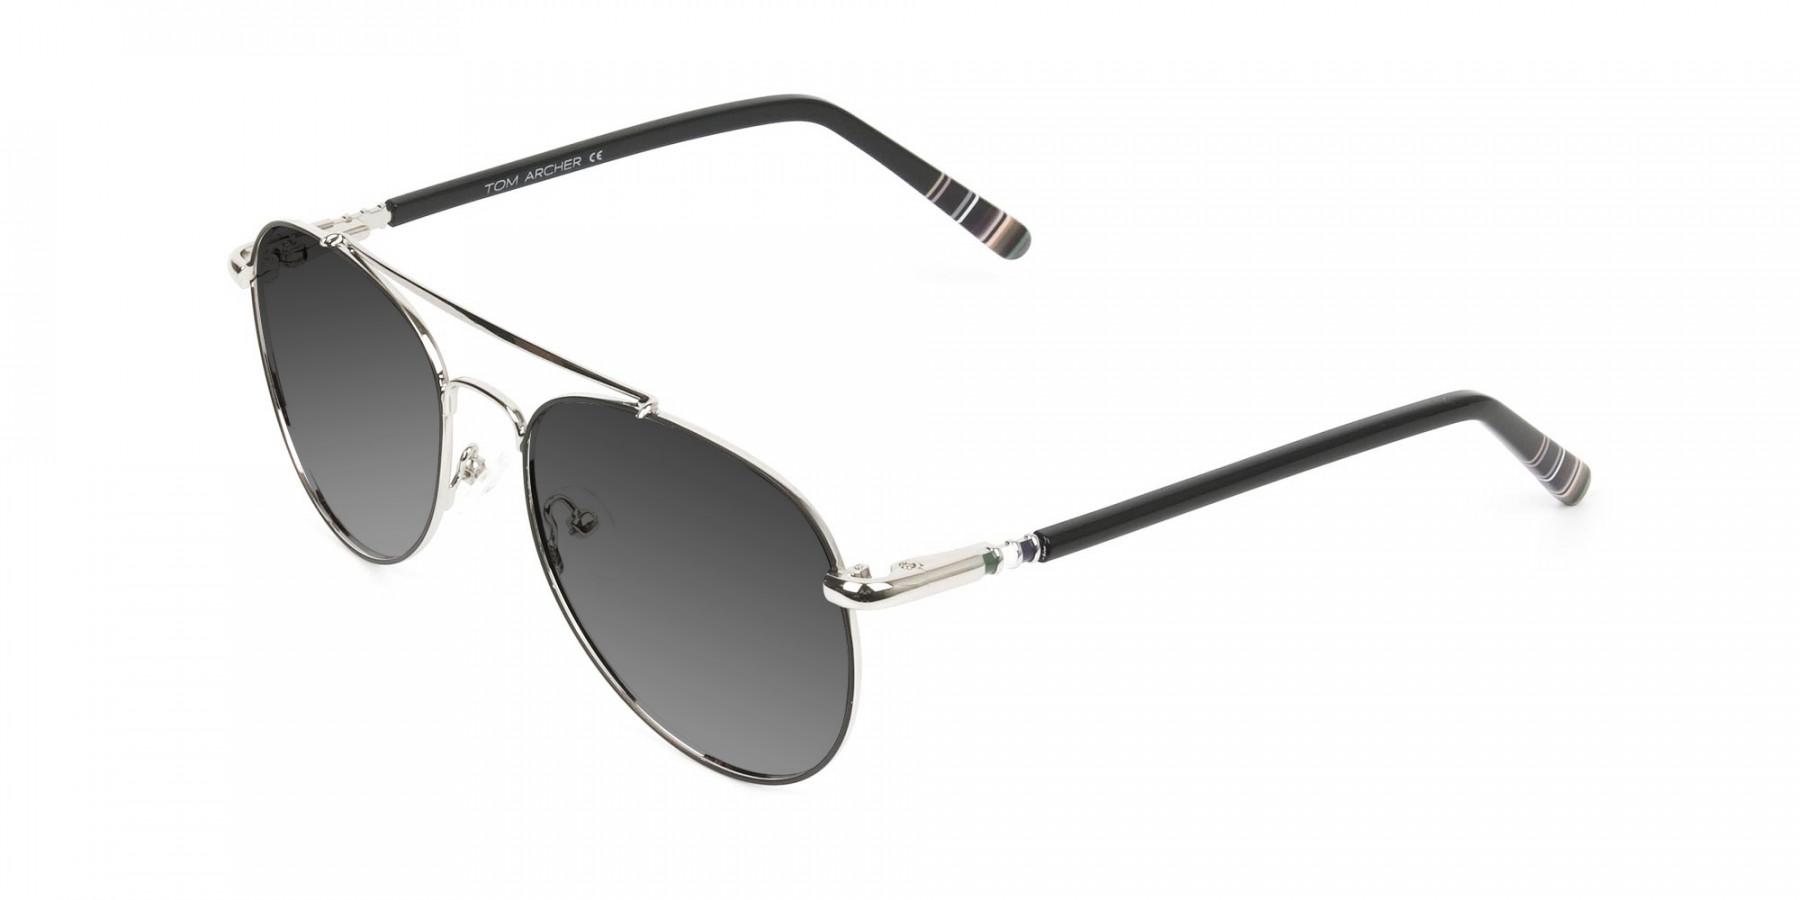 black-silver-fine-metal-grey-tinted-aviator-sunglasses-3